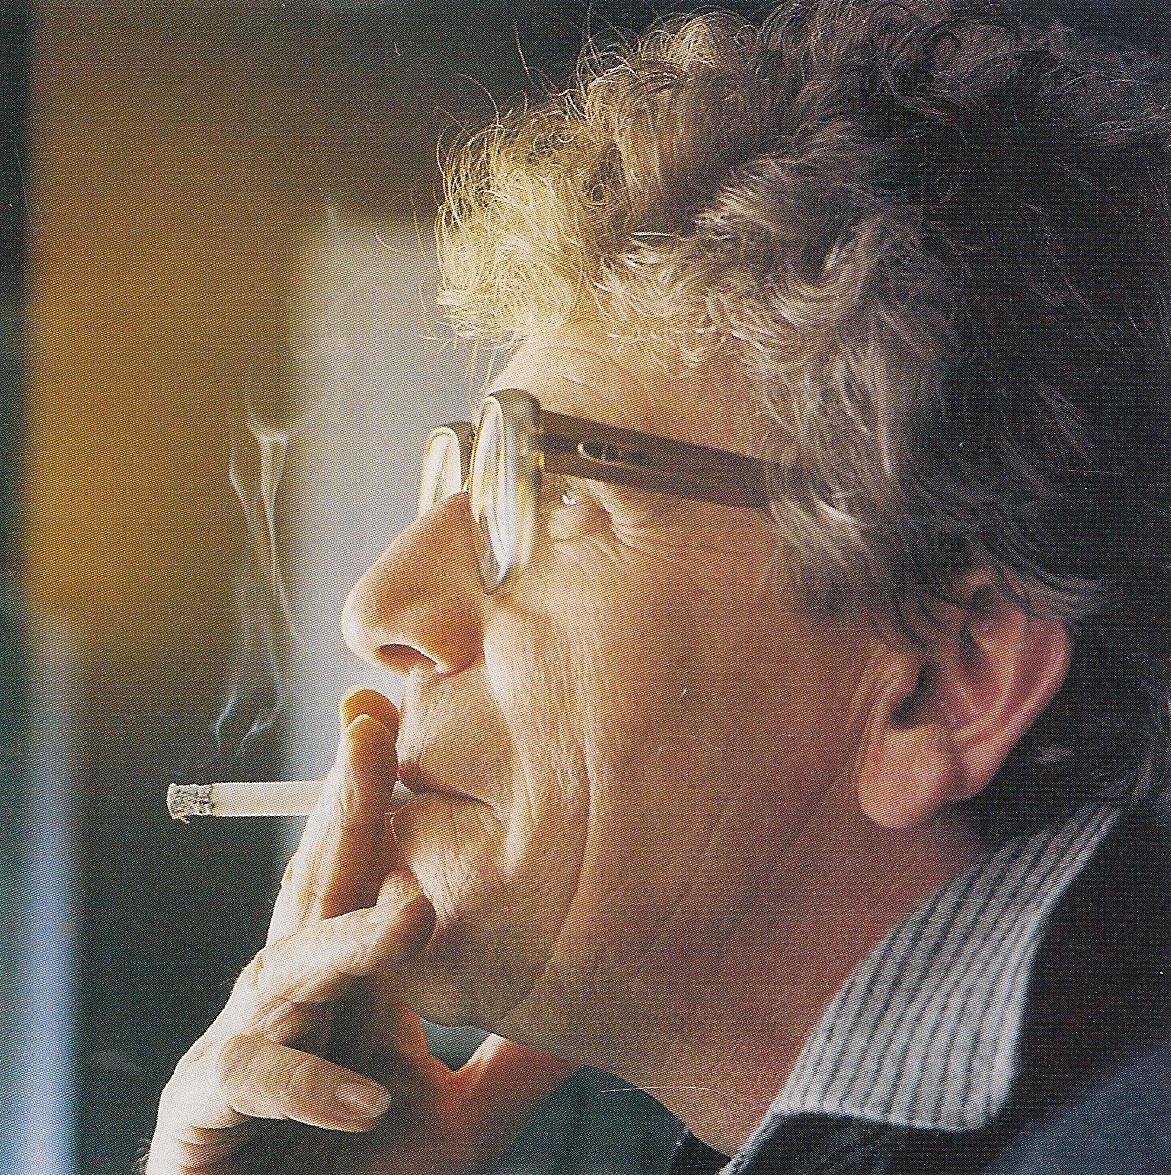 Pierre Vlerick